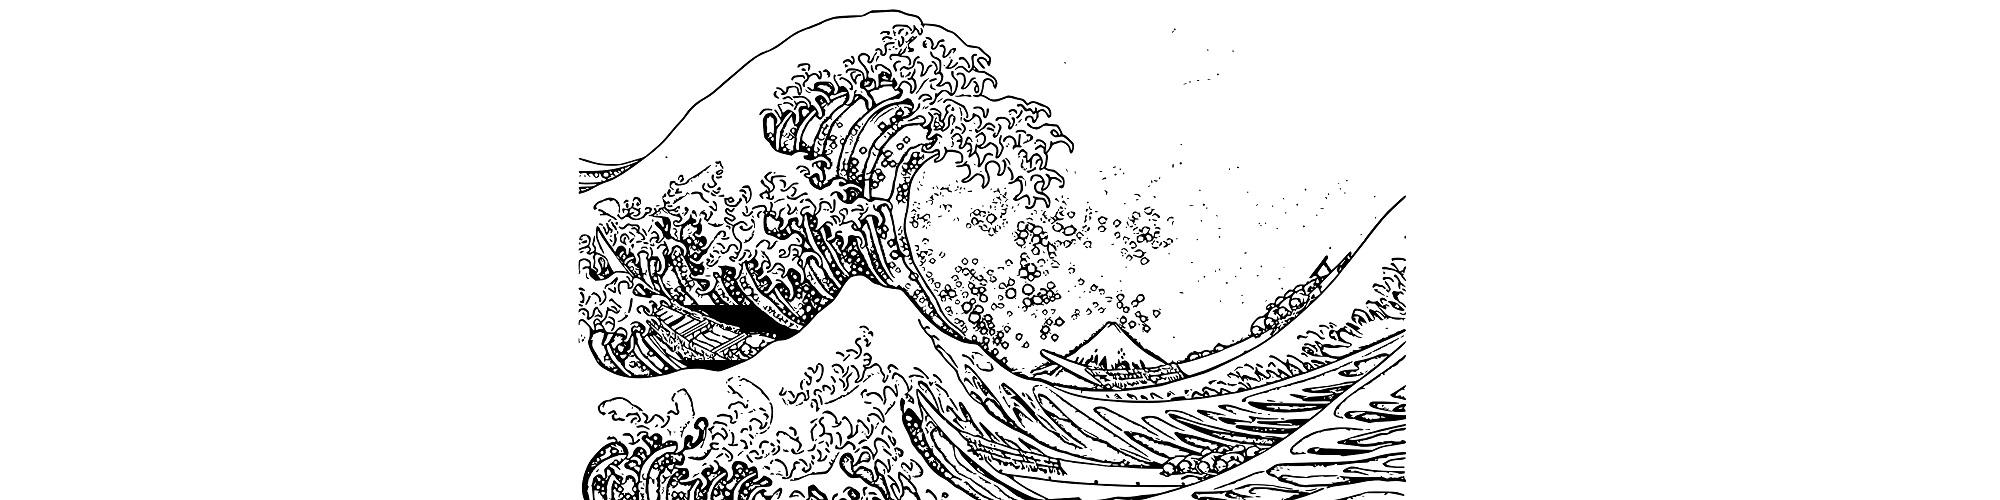 "Waves illustration - ""Off to Sea"" microfiction"